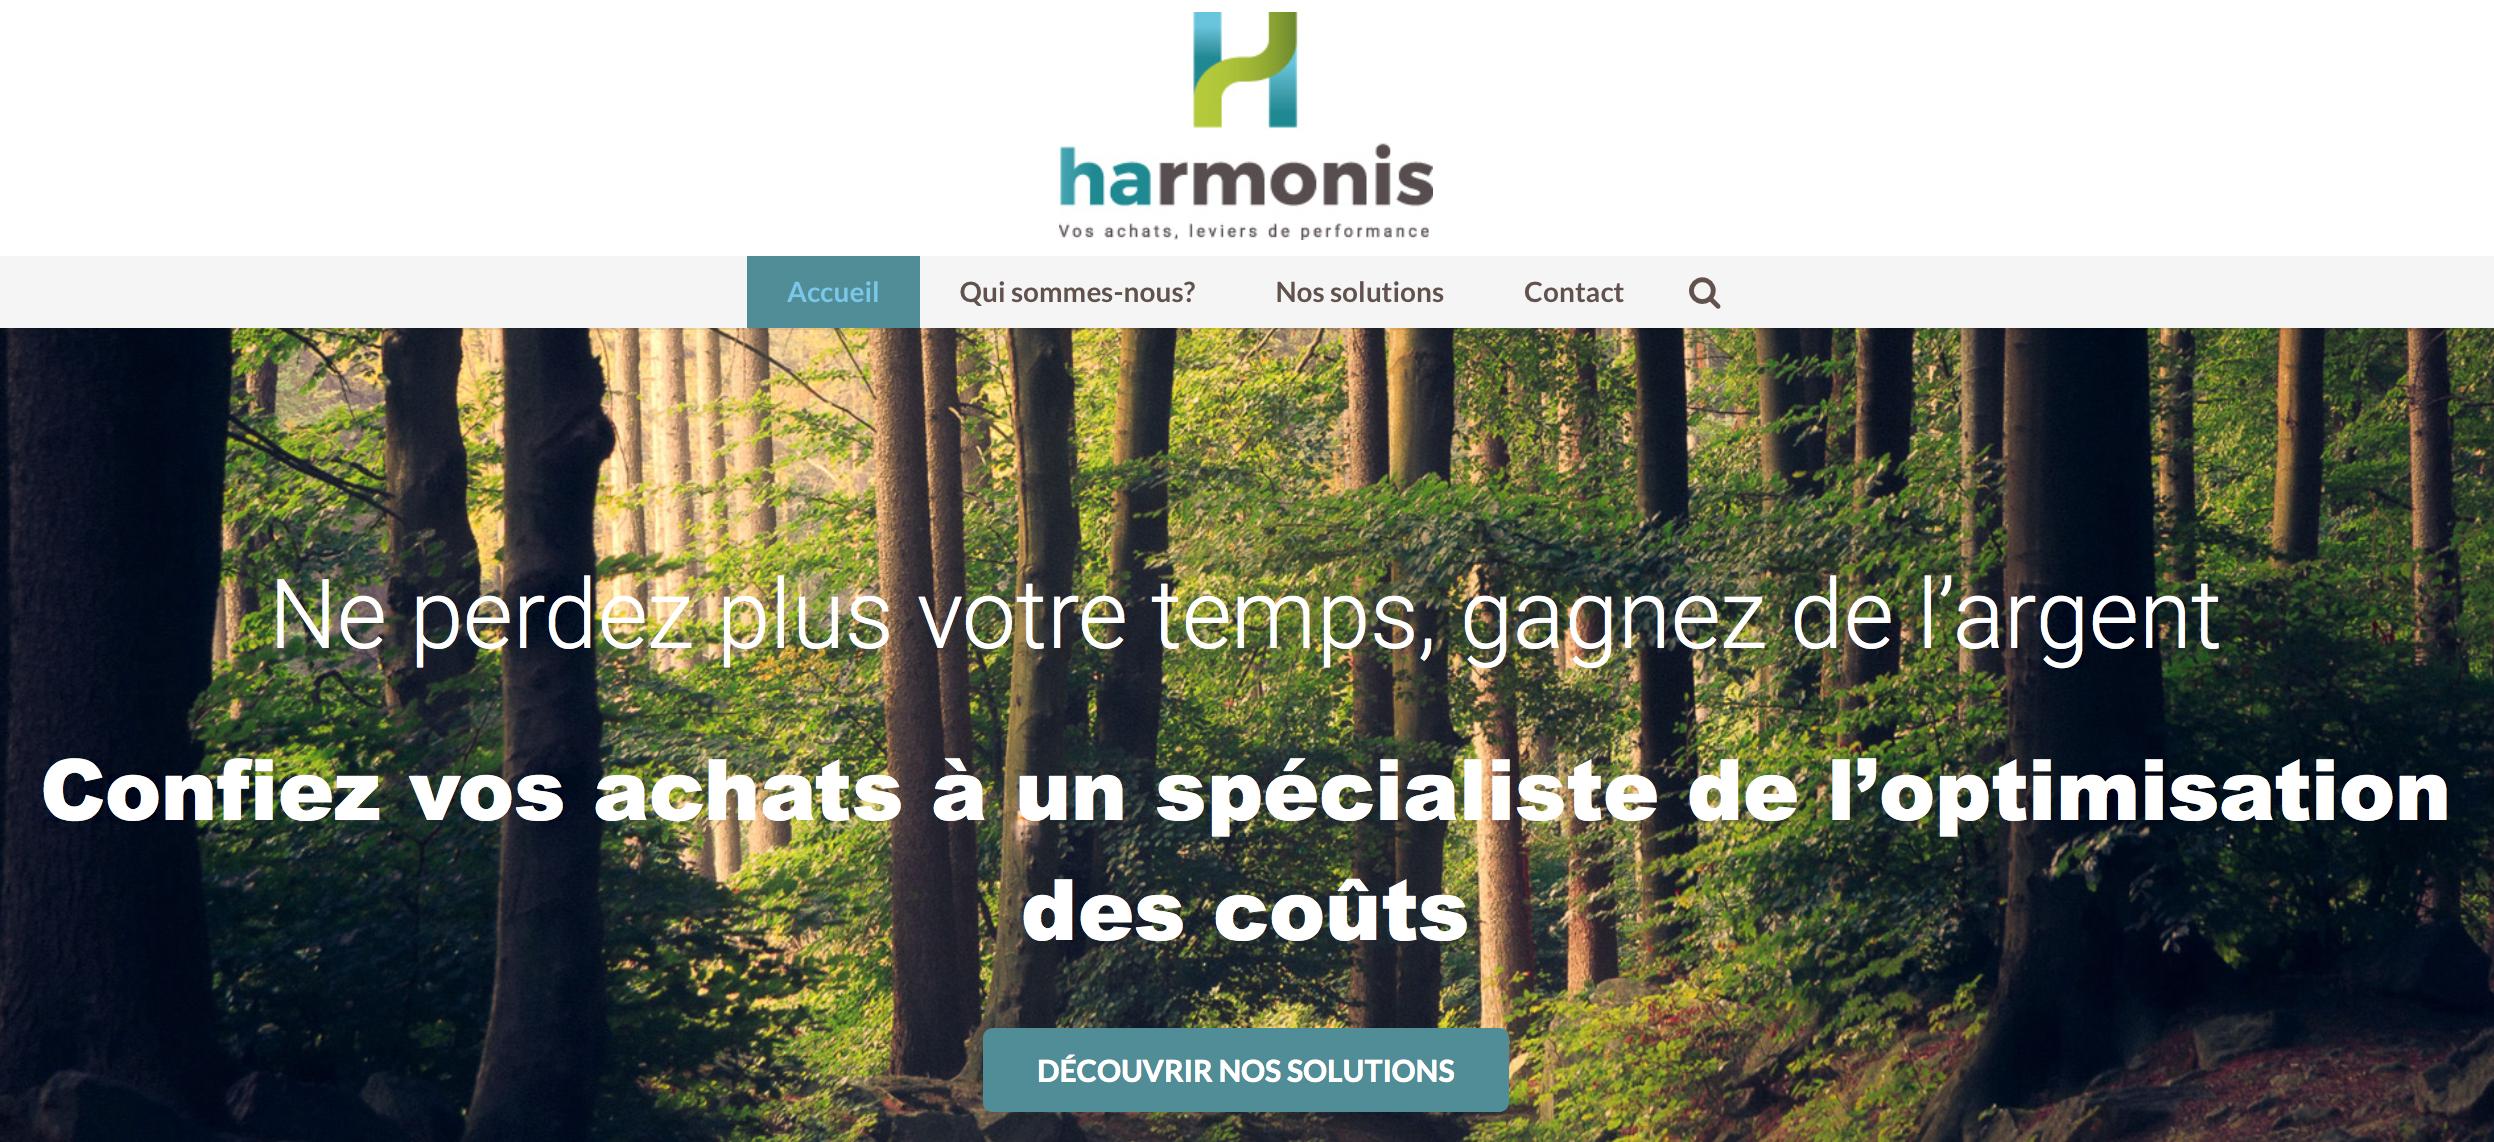 harmonis-solutions